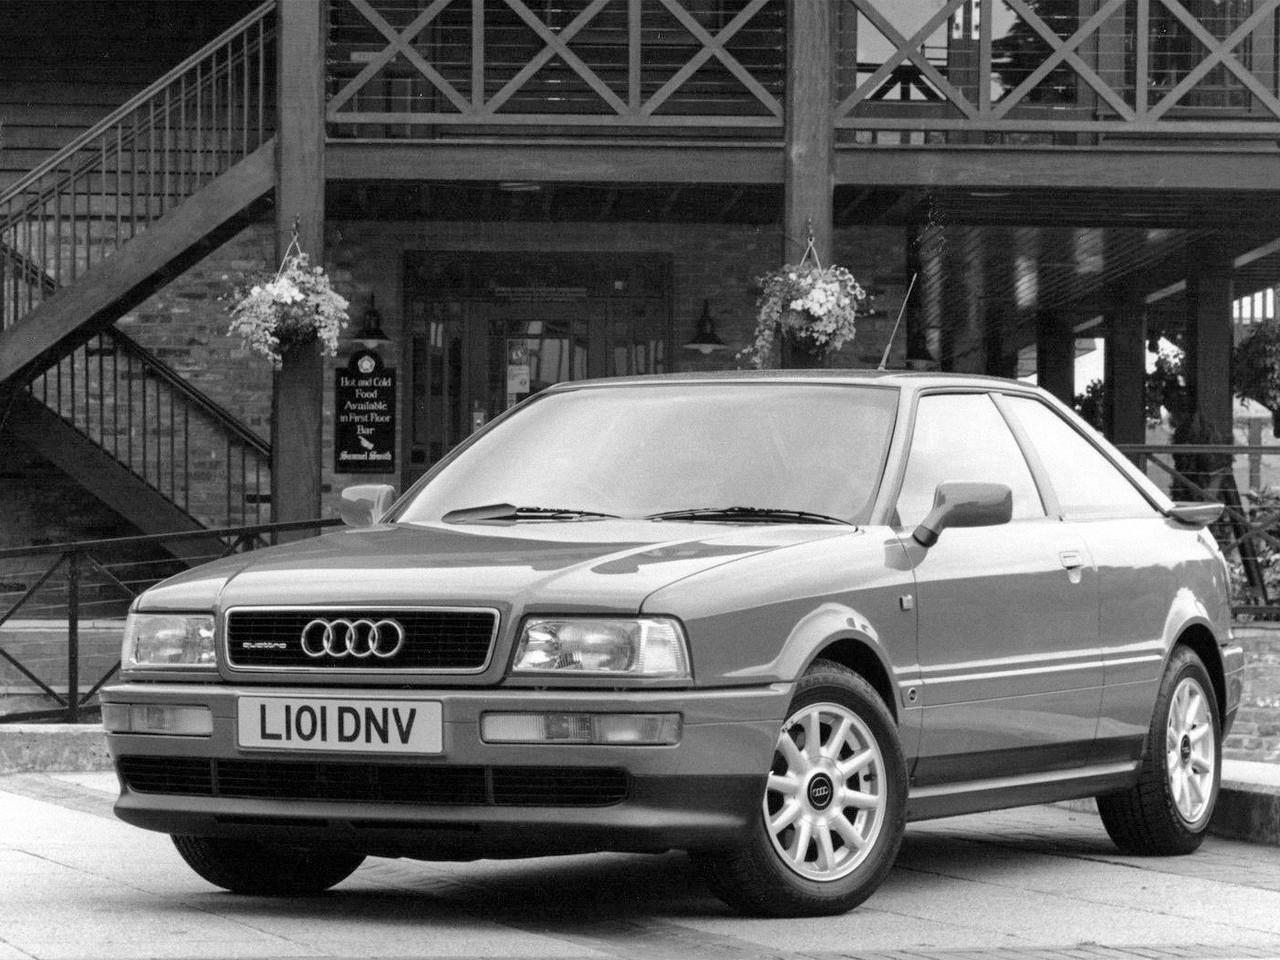 AUDI Coupe (B4) specs - 1991, 1992, 1993, 1994, 1995, 1996 - autoevolution